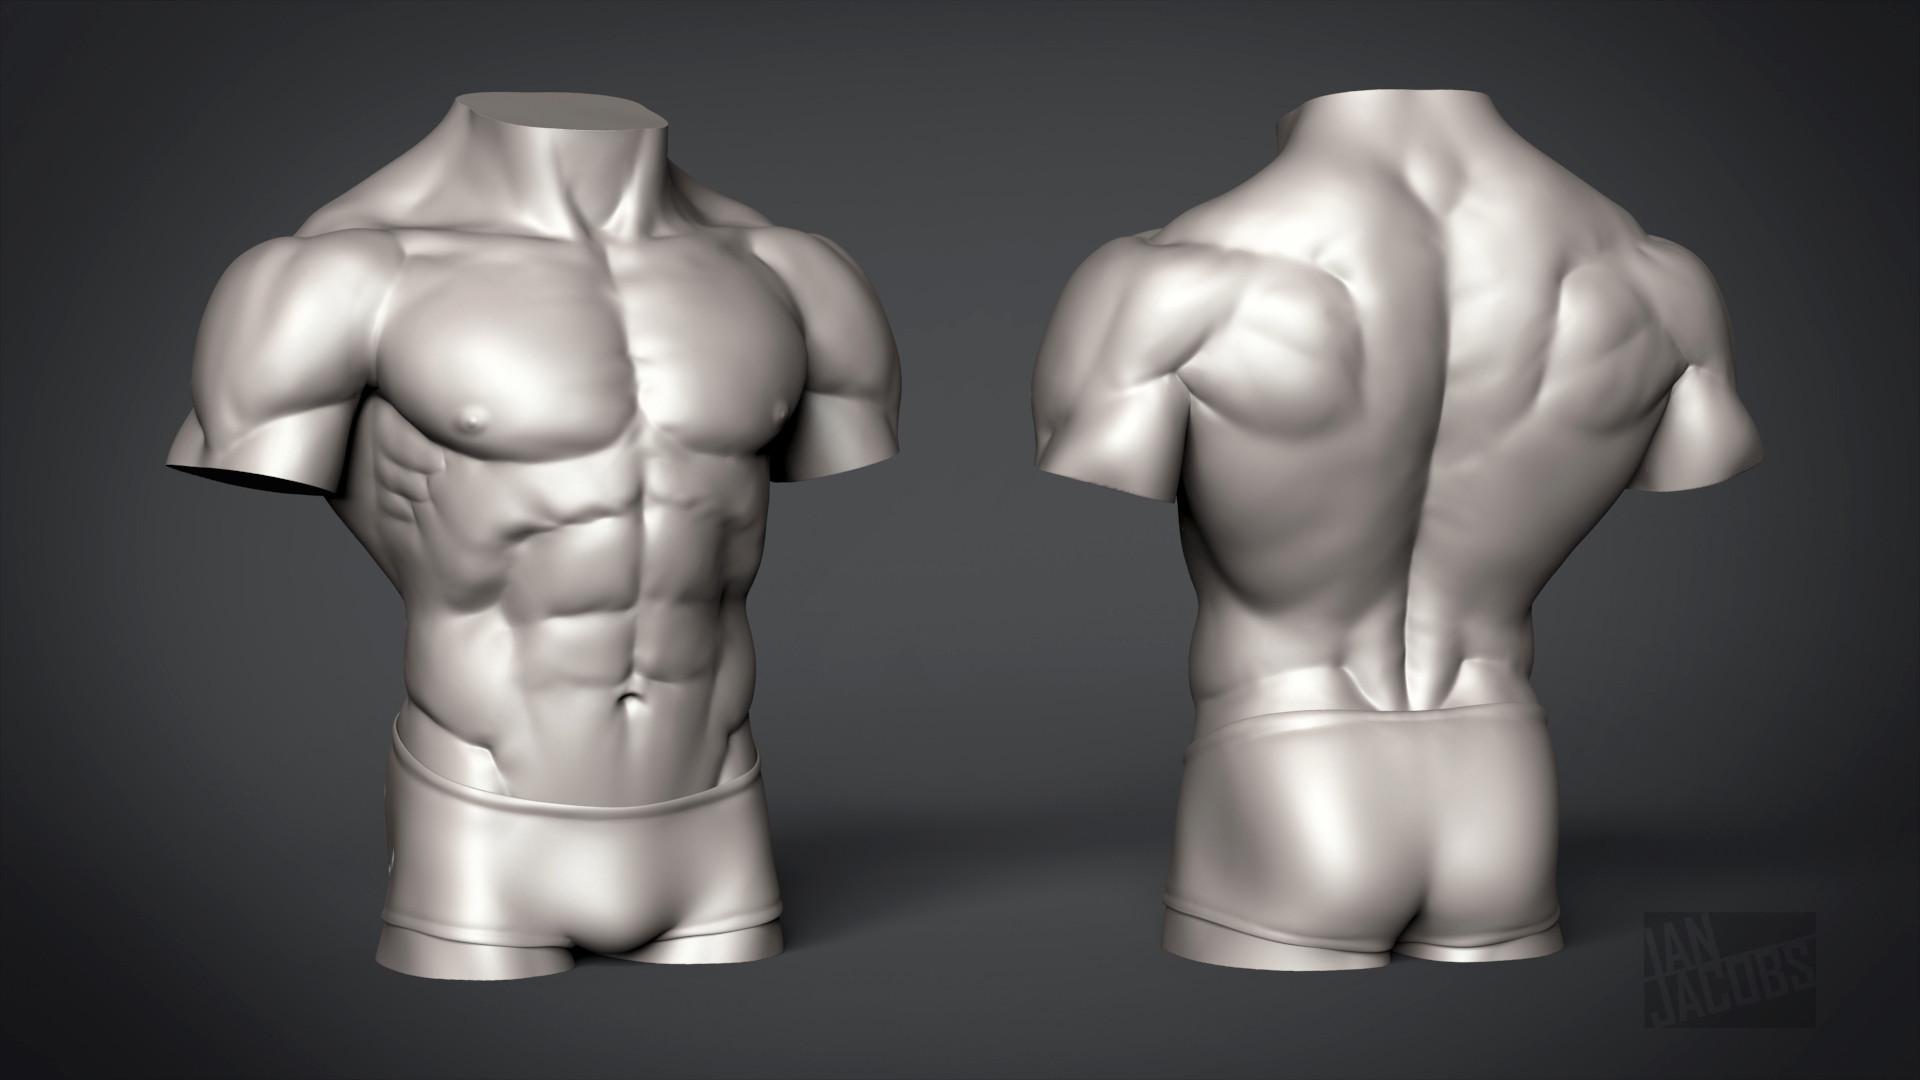 Torso Male Images - human anatomy organs diagram